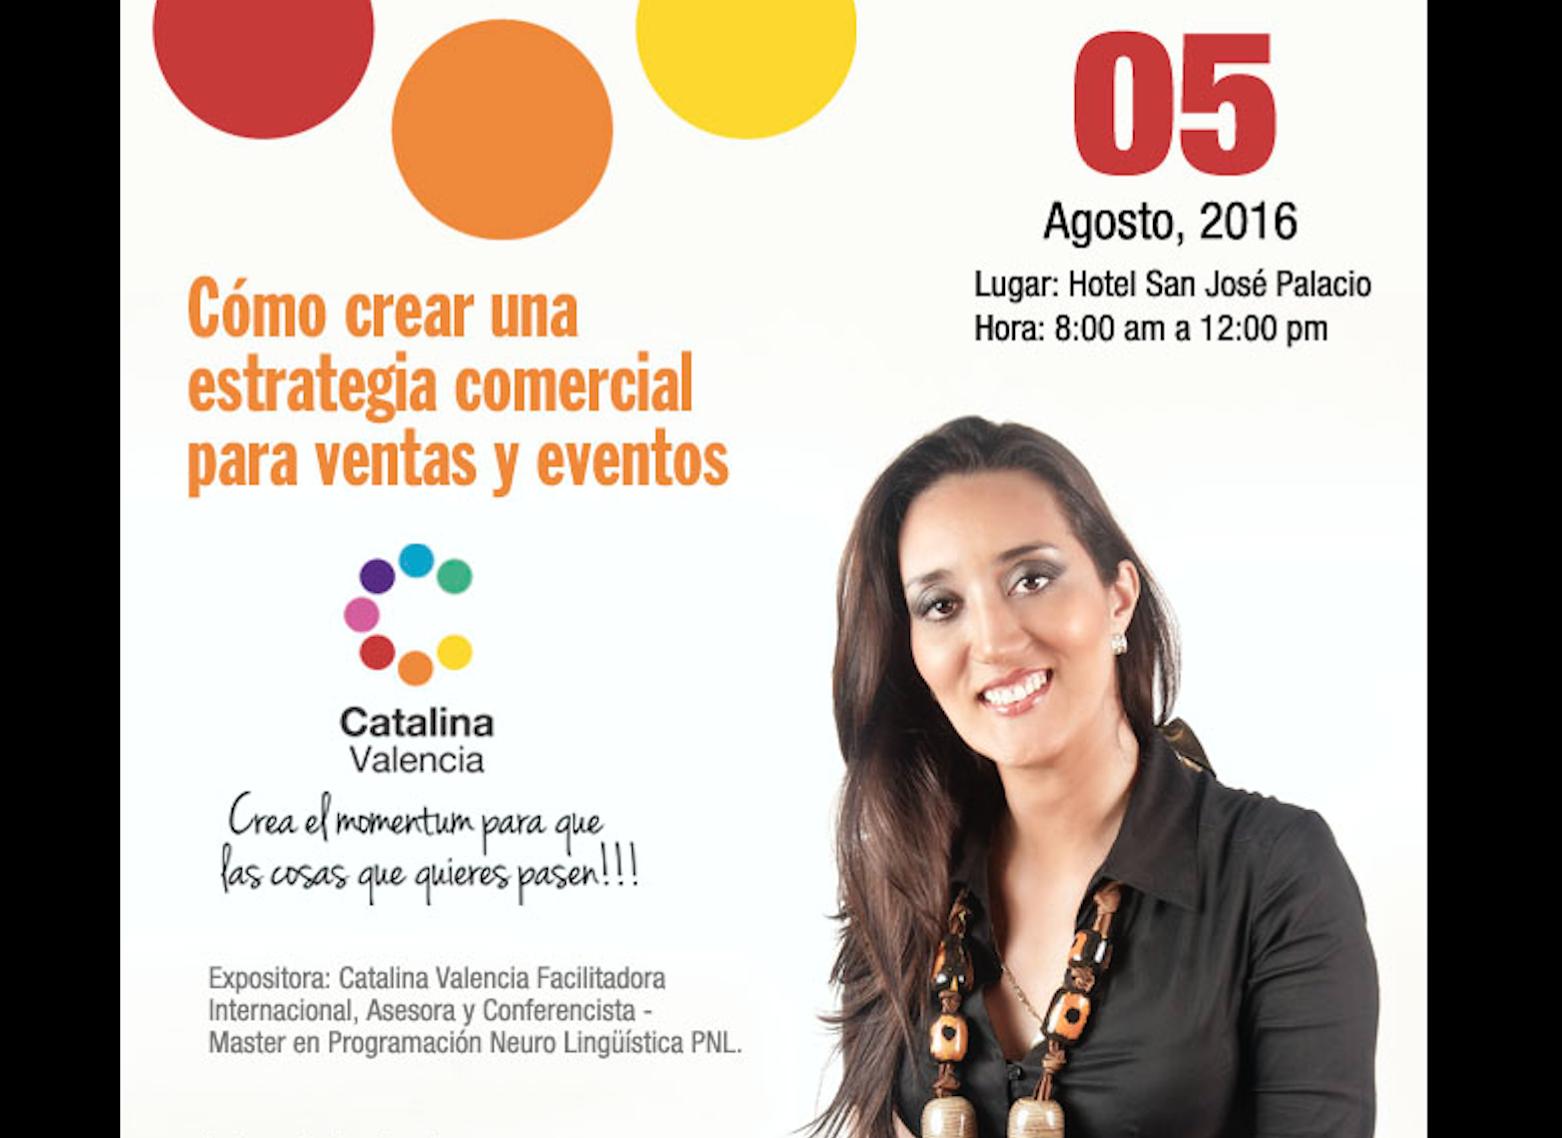 https://www.ekaenlinea.com/wp-content/uploads/2016/07/Estrategia-Comercial.png